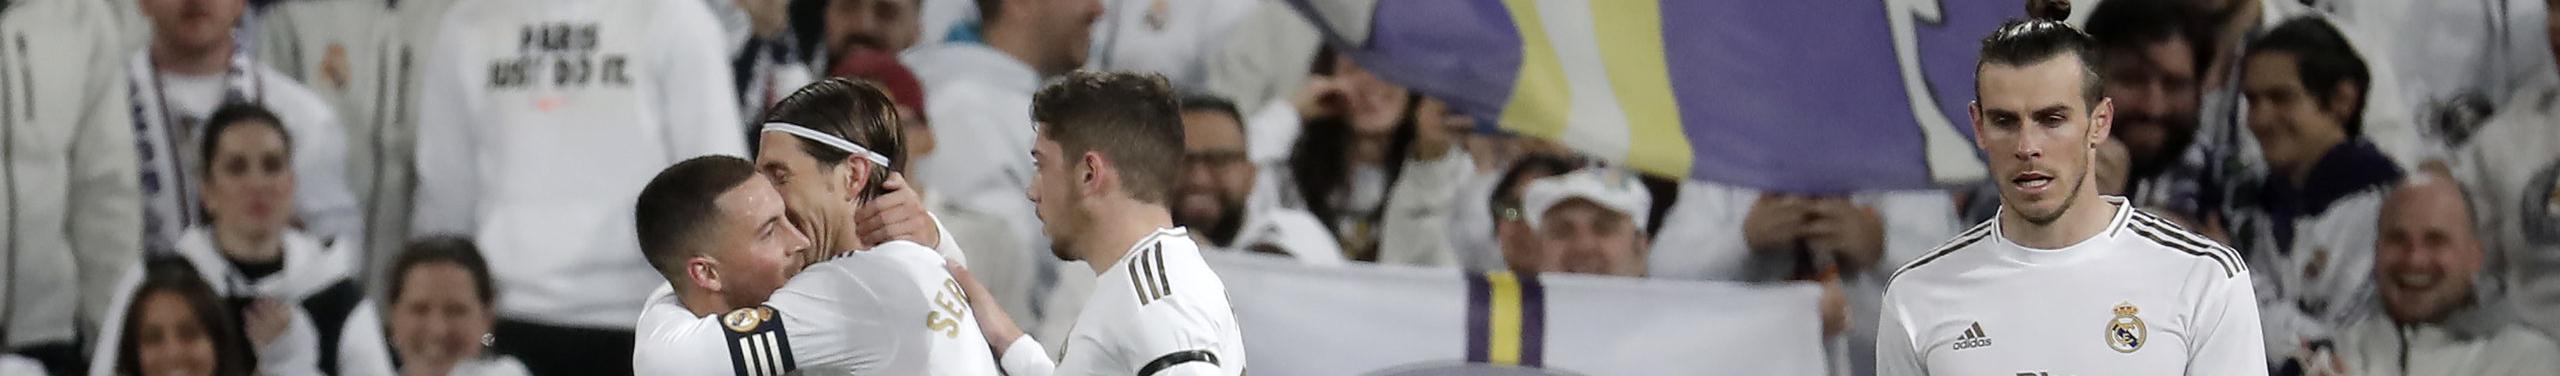 Levante-Real Madrid, i blancos cercano lo slancio in vista di Champions e Clásico